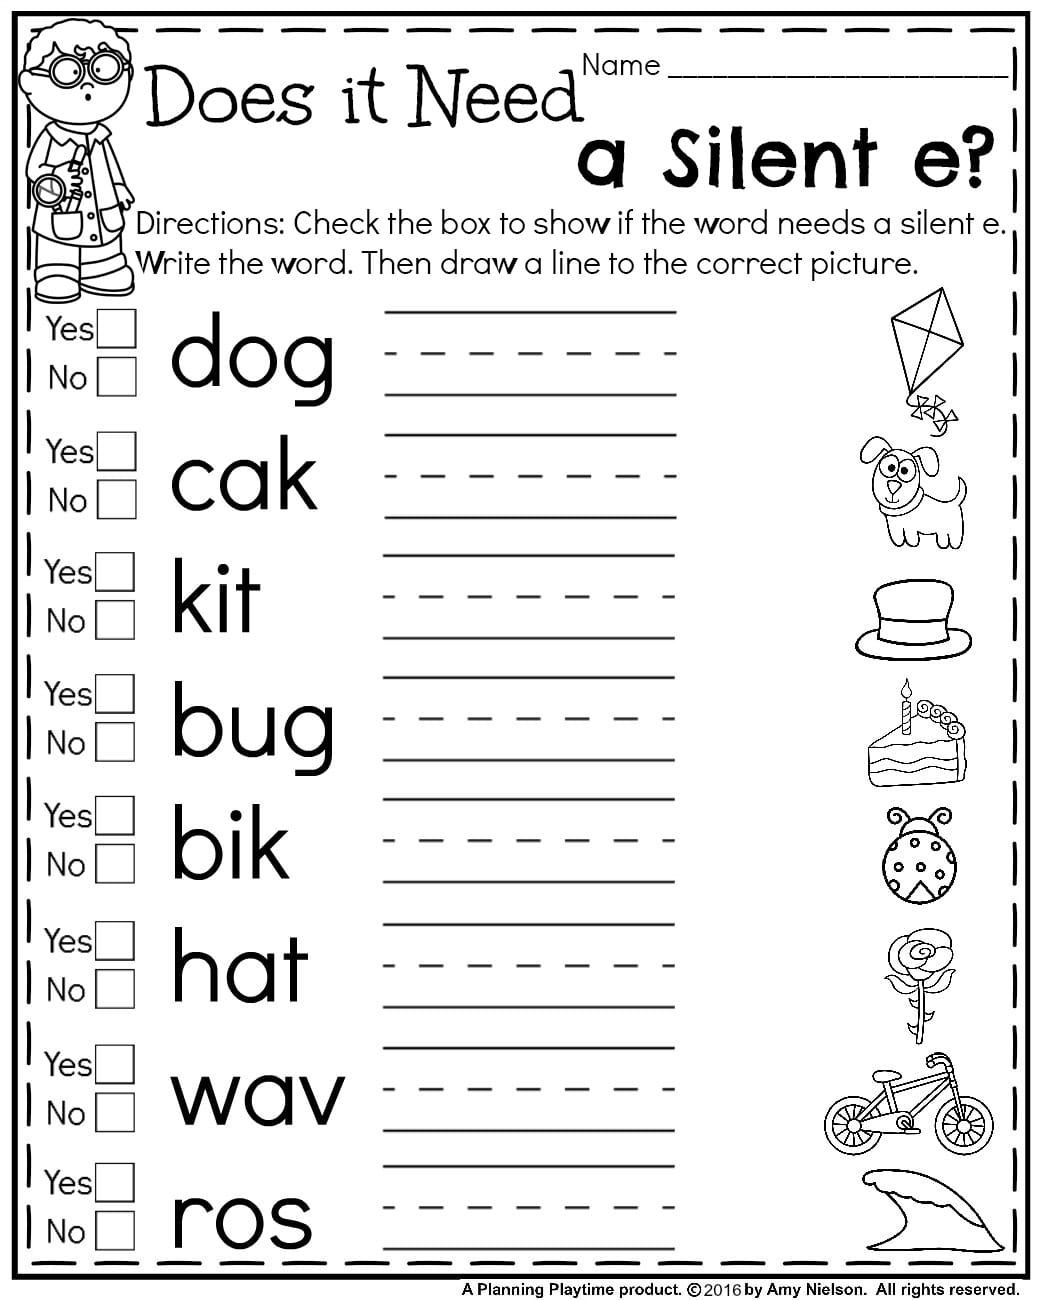 small resolution of https://cute766.info/first-grade-silent-e-worksheets-for-summer-1st-grade-worksheets-2nd-grade-worksheets-first/